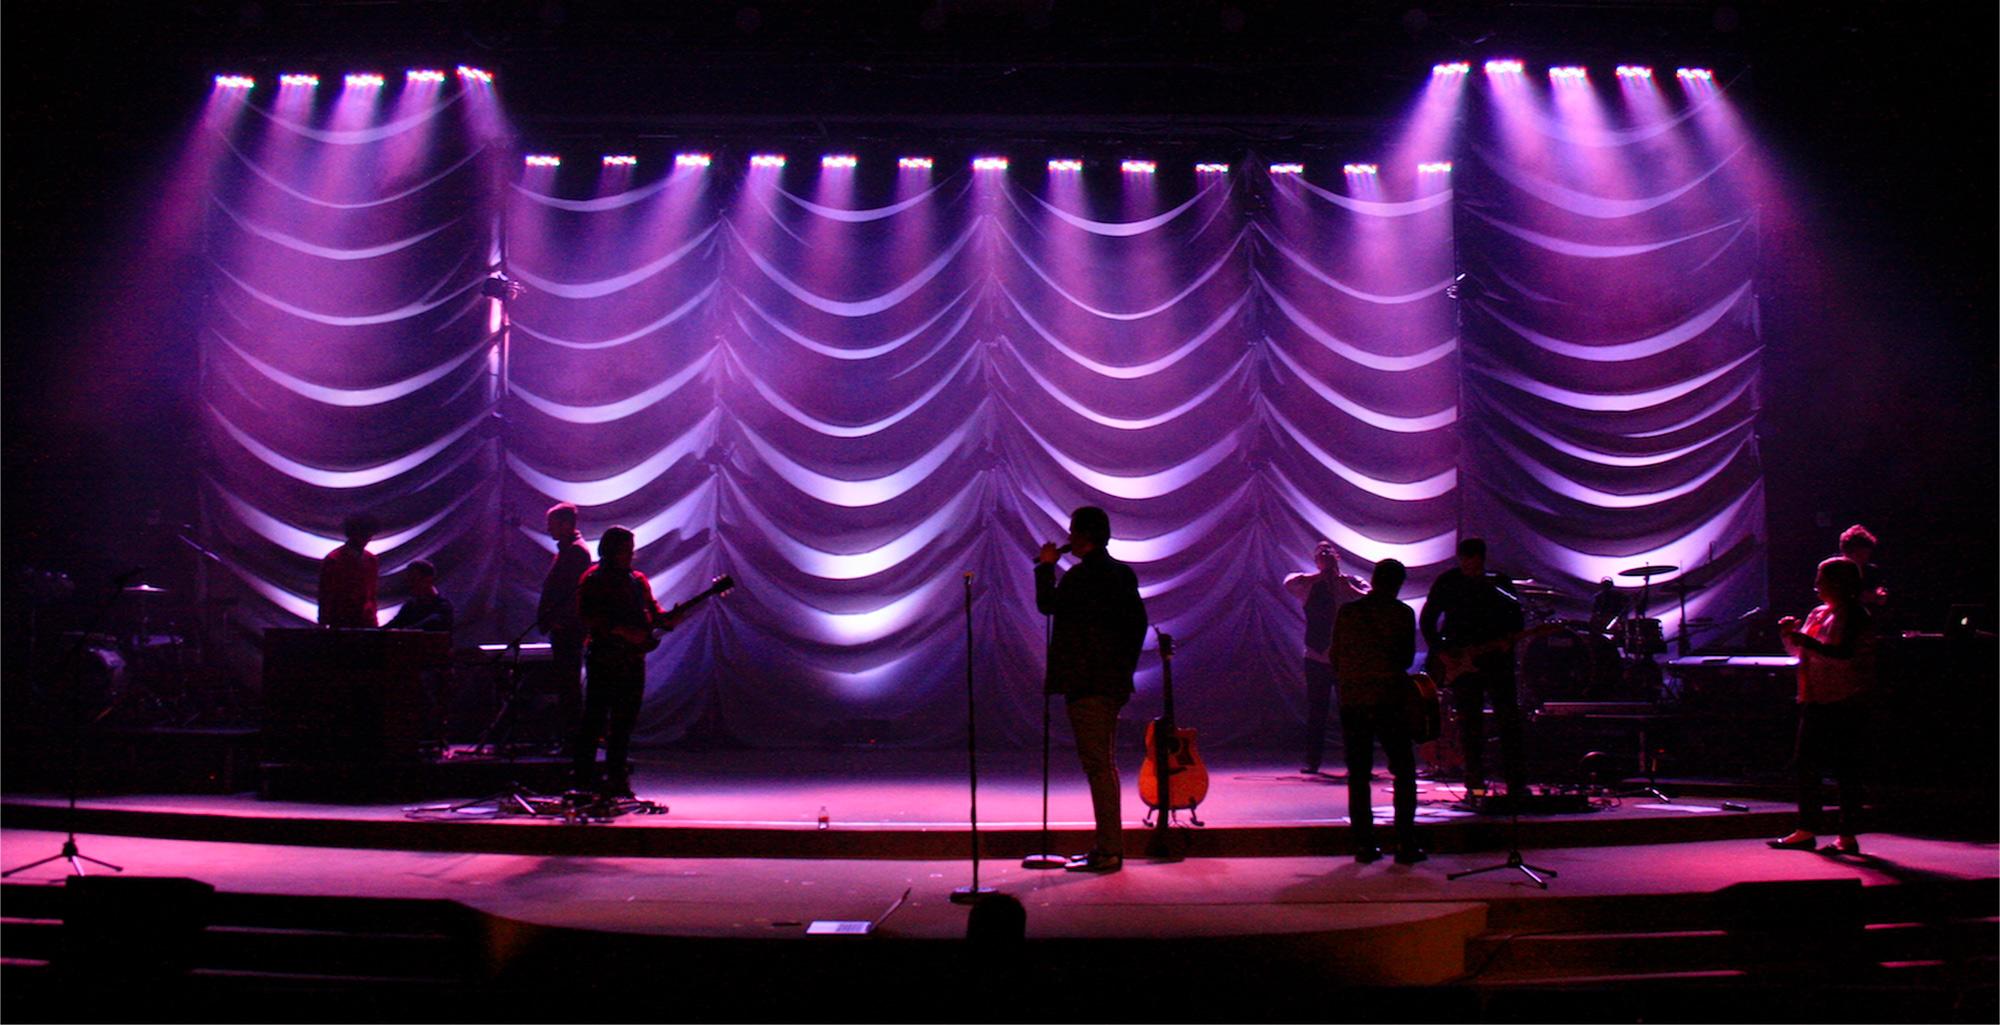 Rippling Background Church Stage Design Ideas